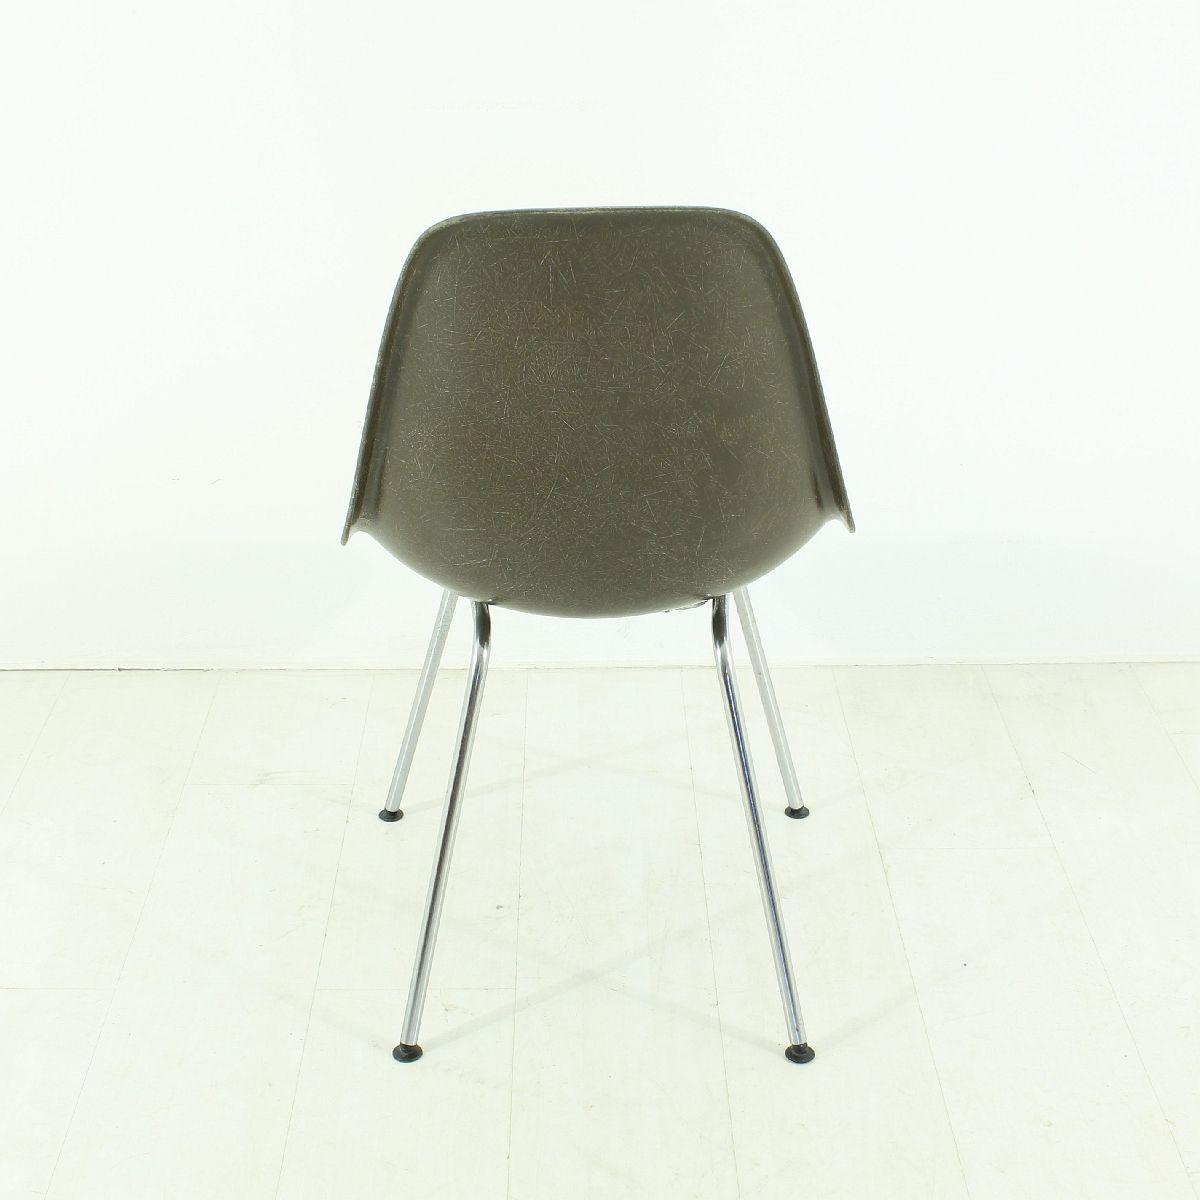 schokobrauner vintage stuhl von charles ray eames f r. Black Bedroom Furniture Sets. Home Design Ideas